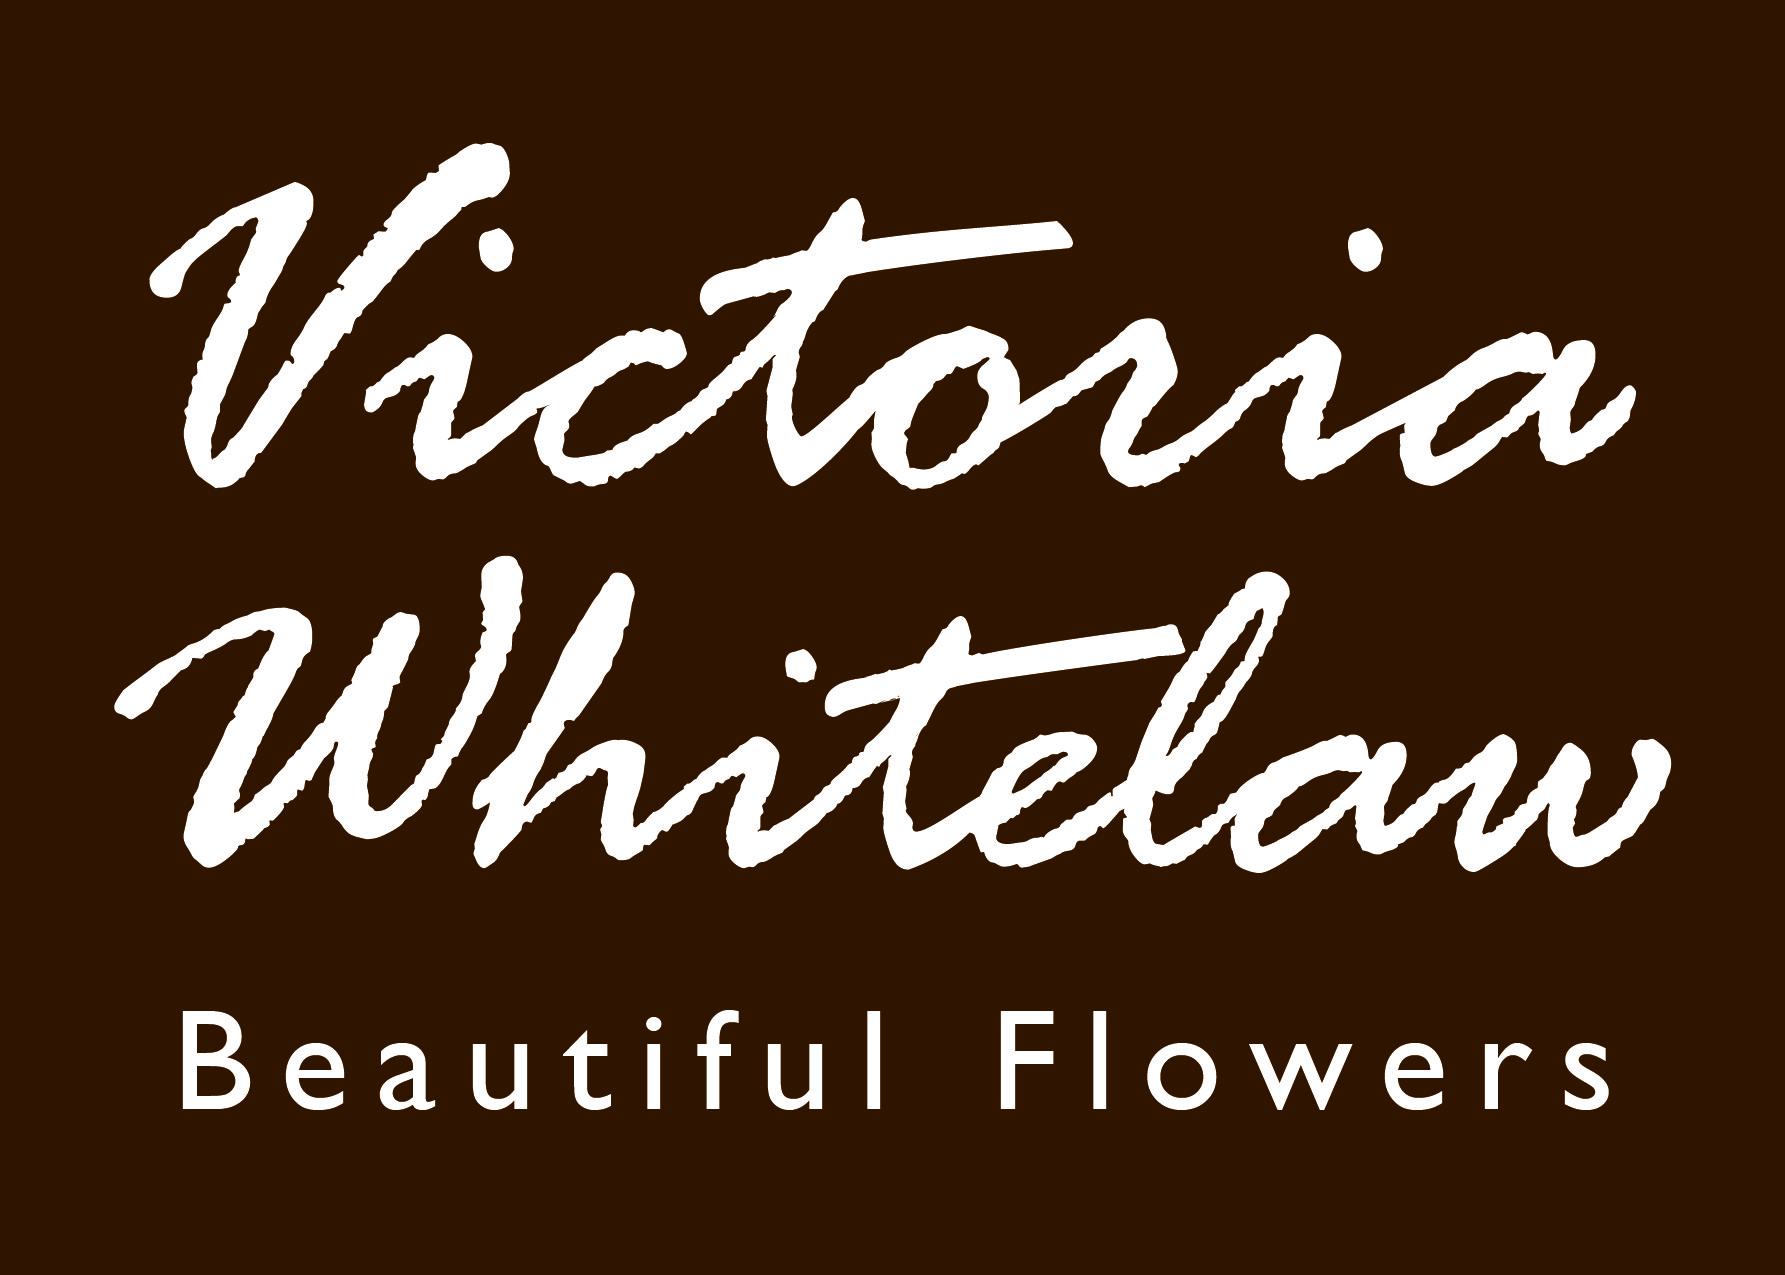 Victoria Whitelaw Beautiful Flowers